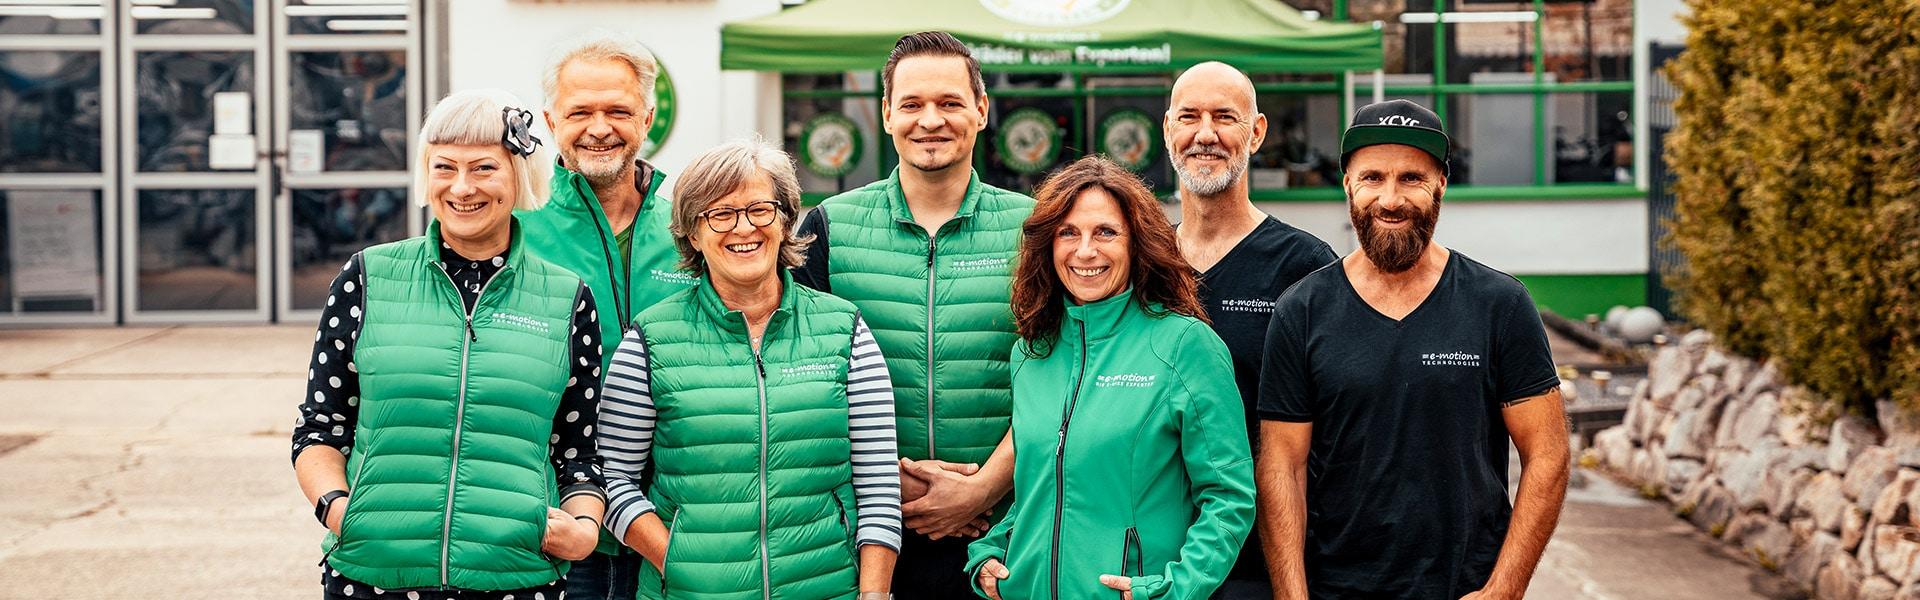 Das Team der e-motion e-Bike Welt Karlsruhe